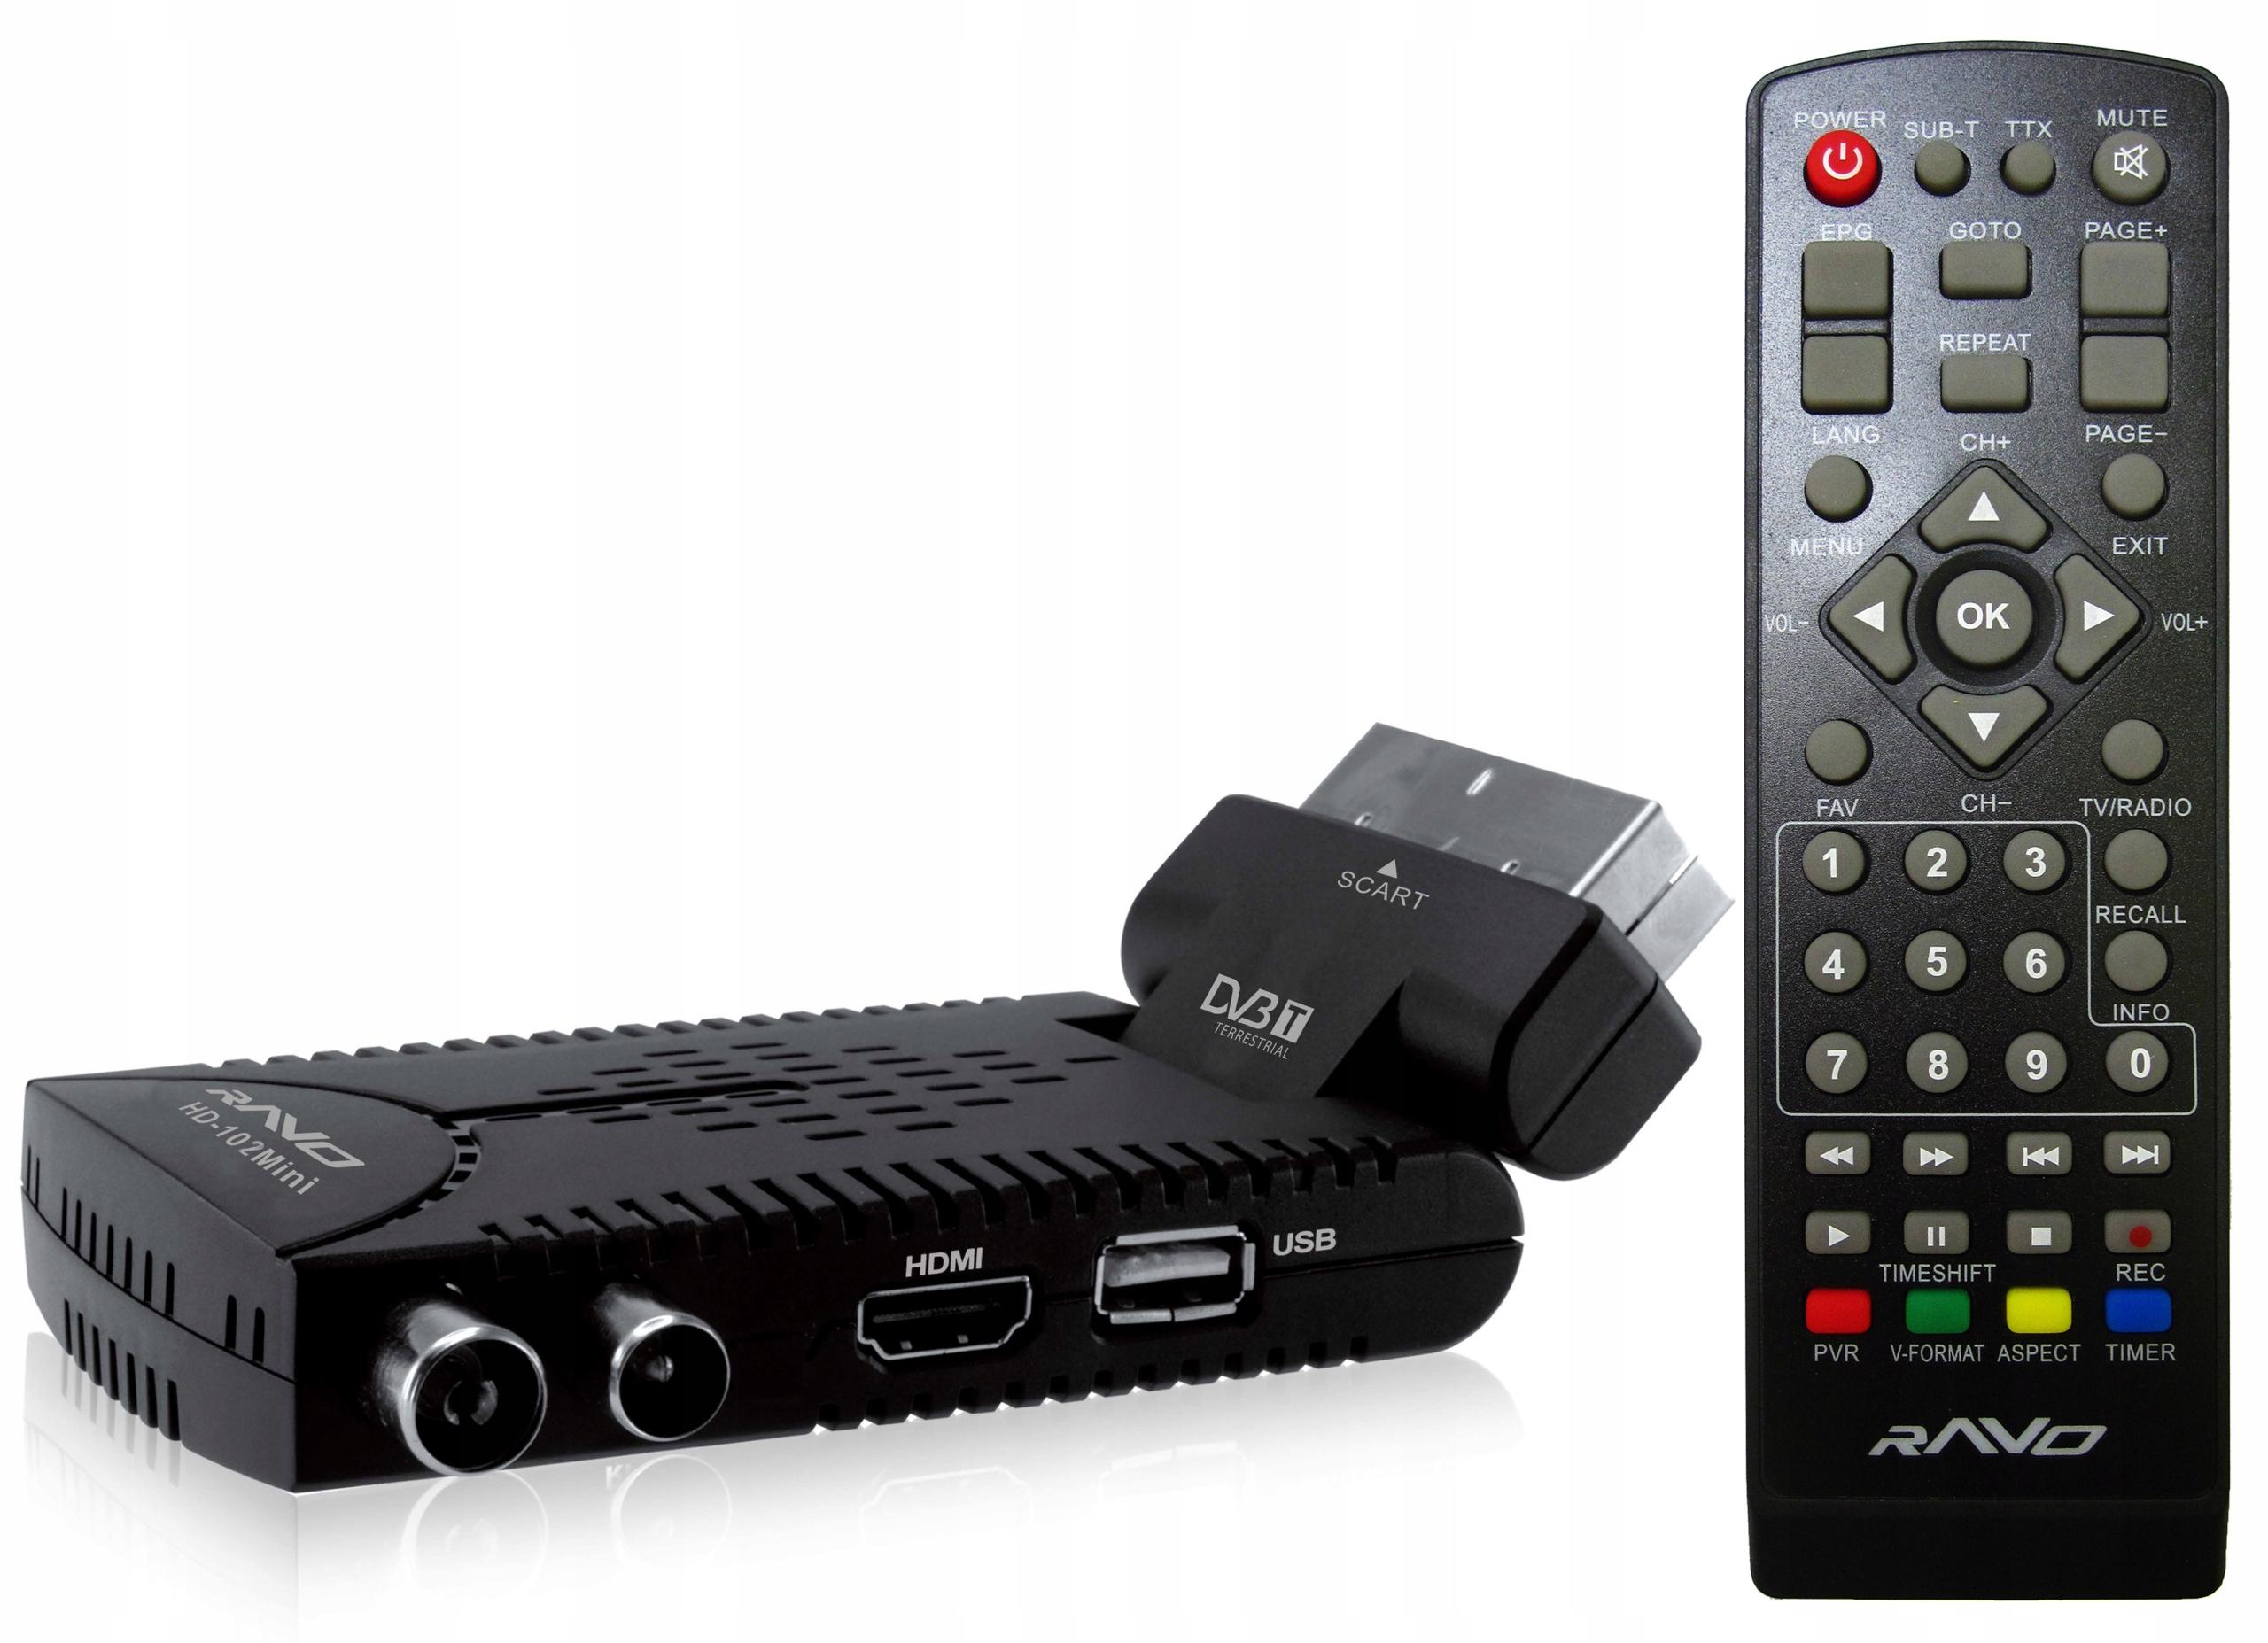 DVB-T TUNER HD-102Mini DEKODER HD MUX8 8519111937 - Sklep internetowy AGD, RTV, telefony, laptopy - Allegro.pl